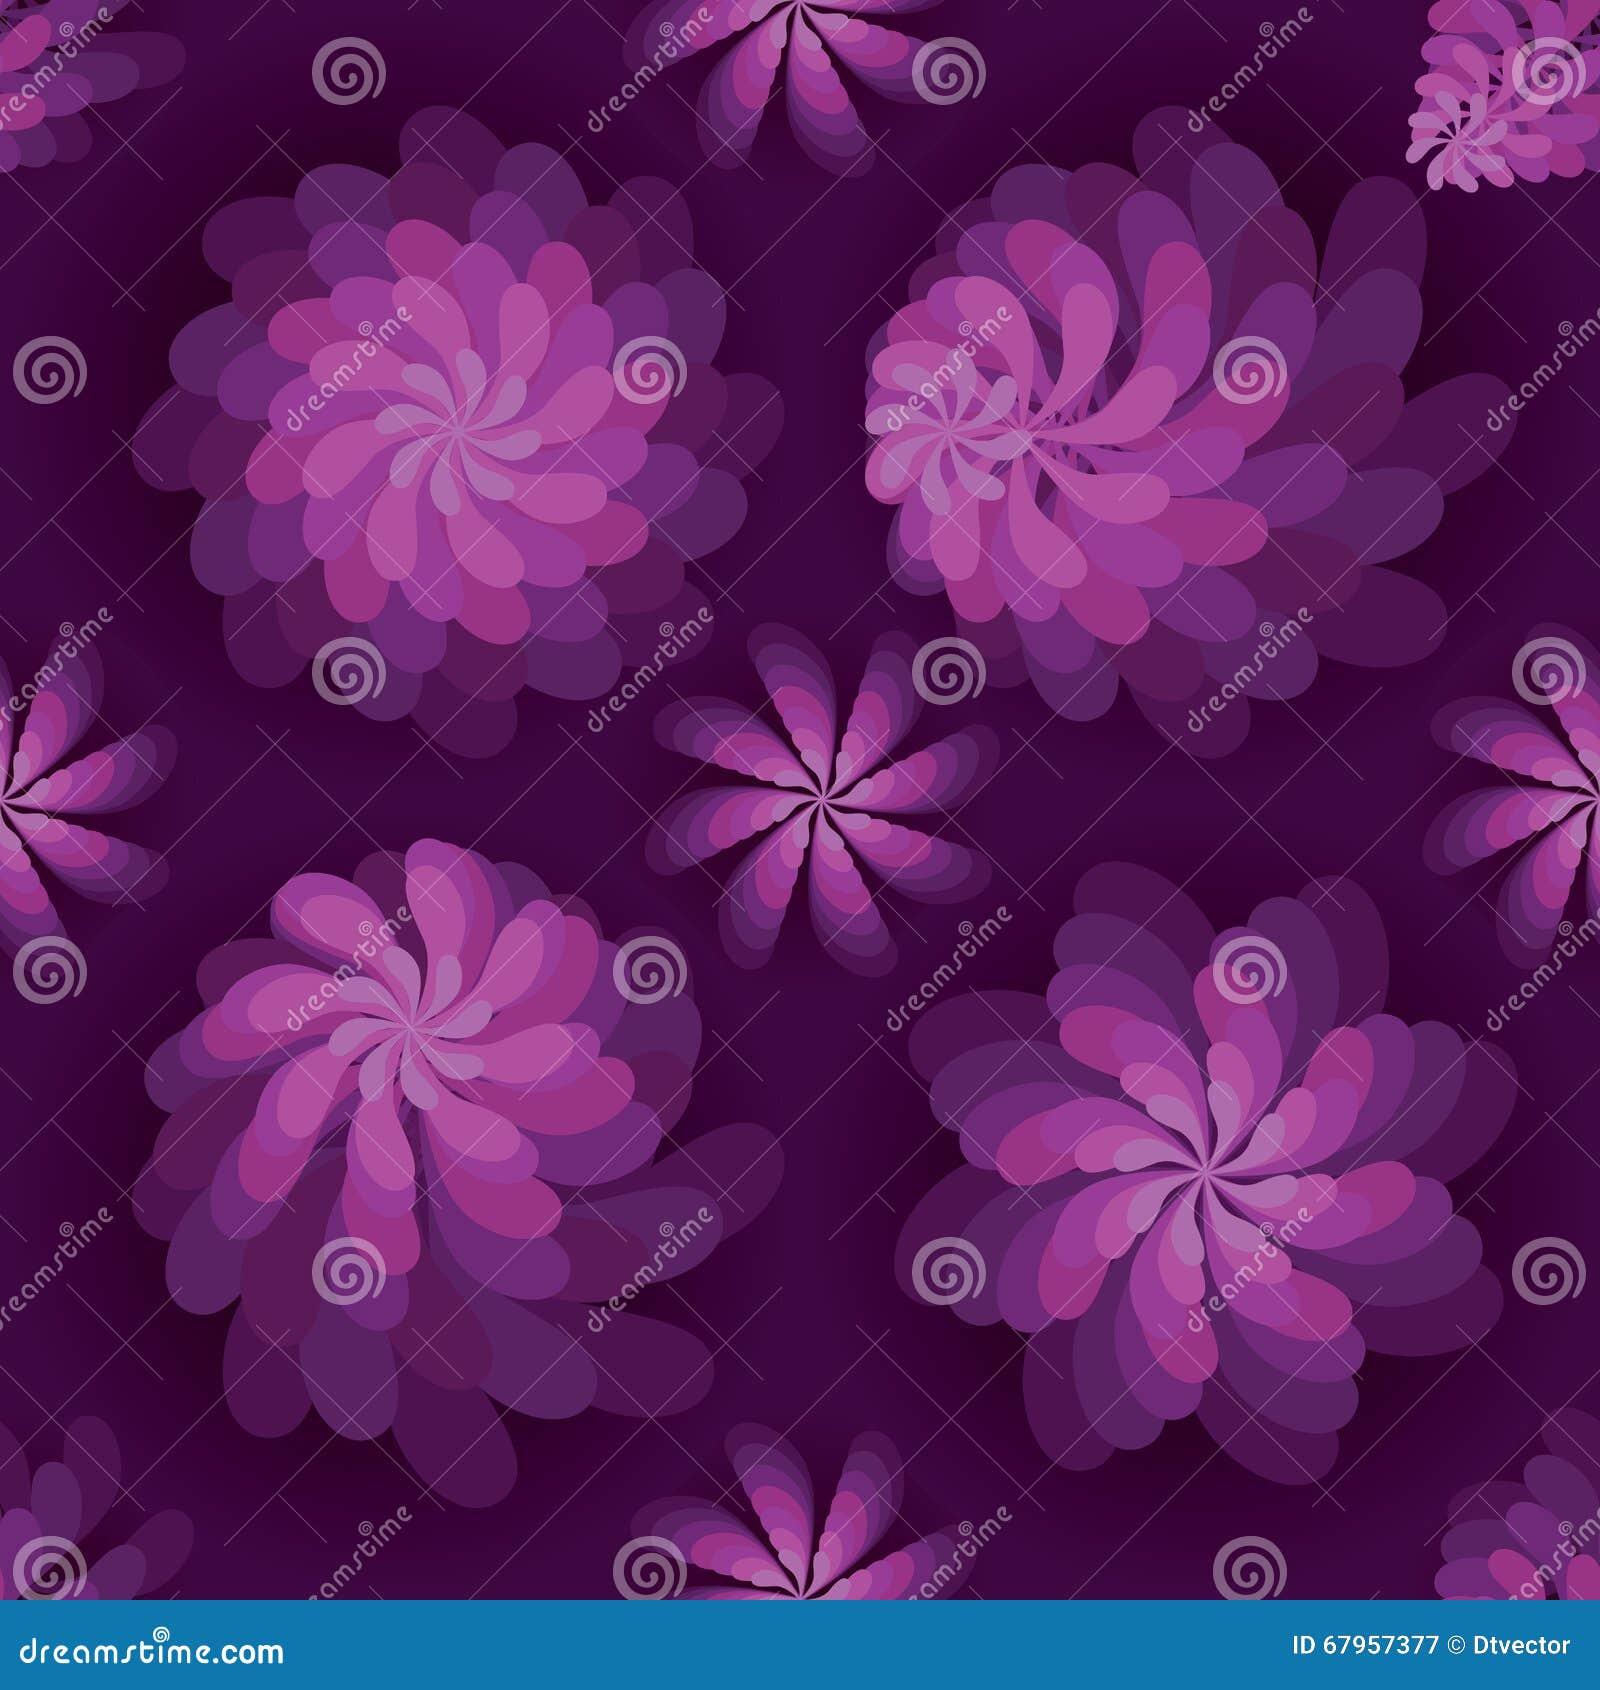 Flower rotate windmill purple mist seamless pattern